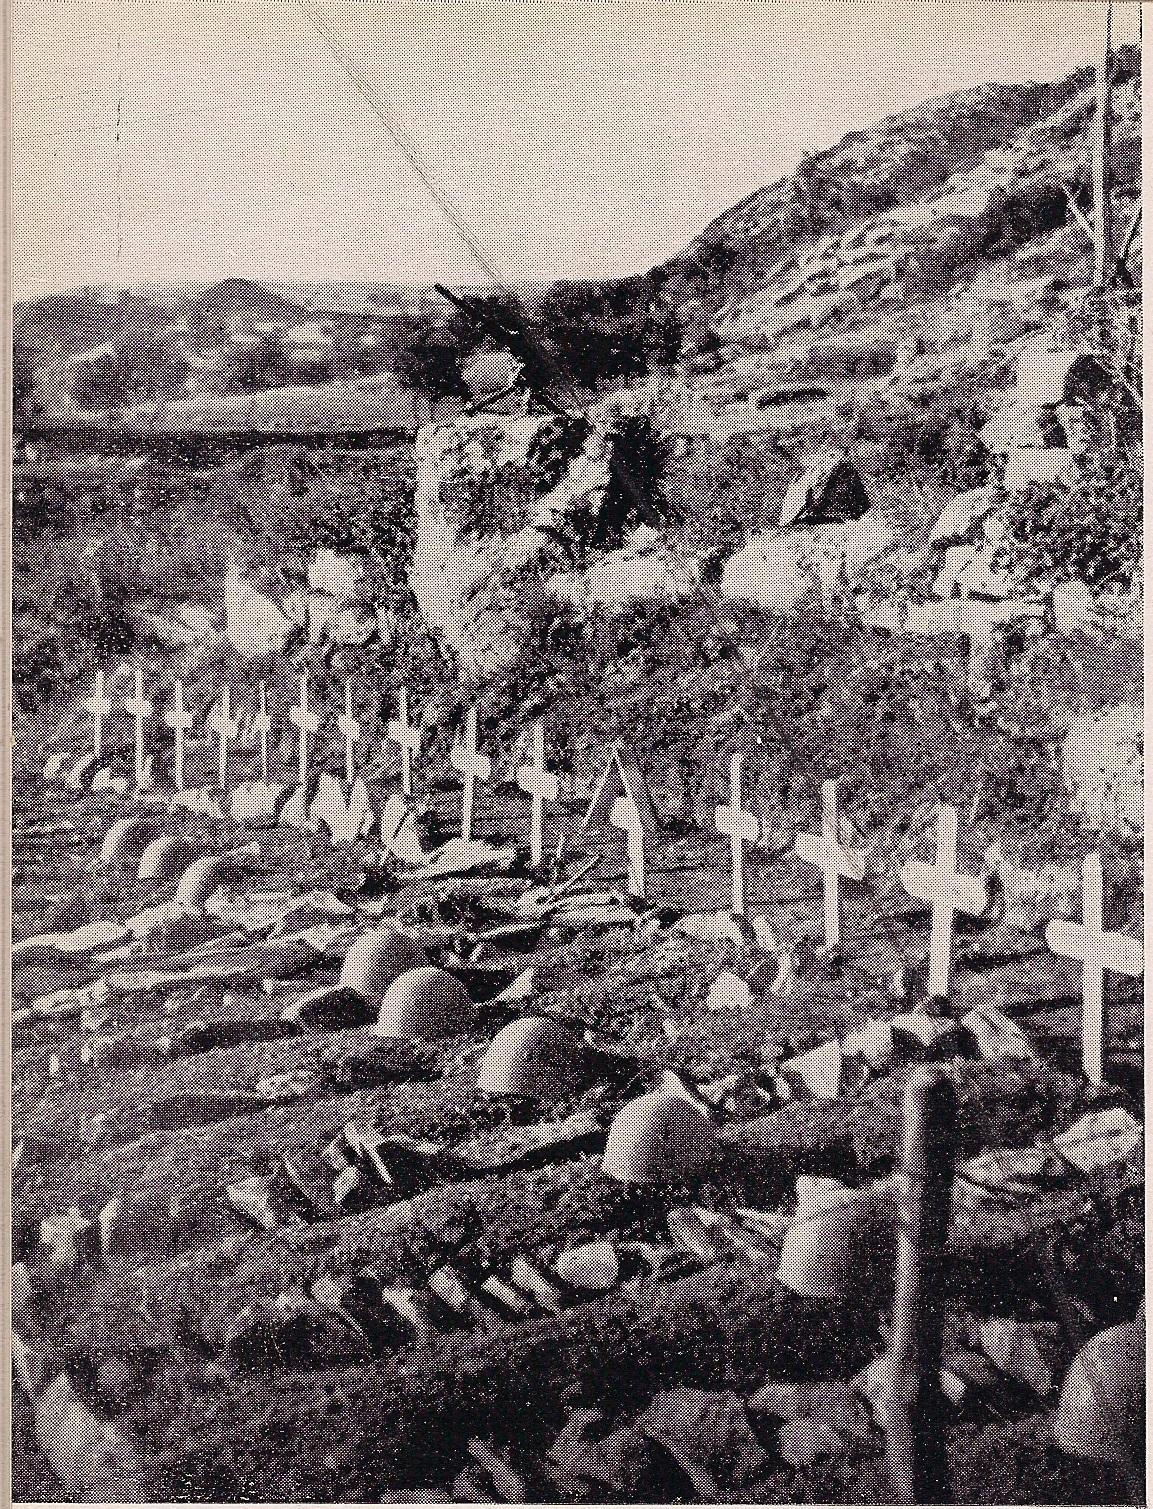 lupi-cimiteri-a-kaizza-in-albania-2